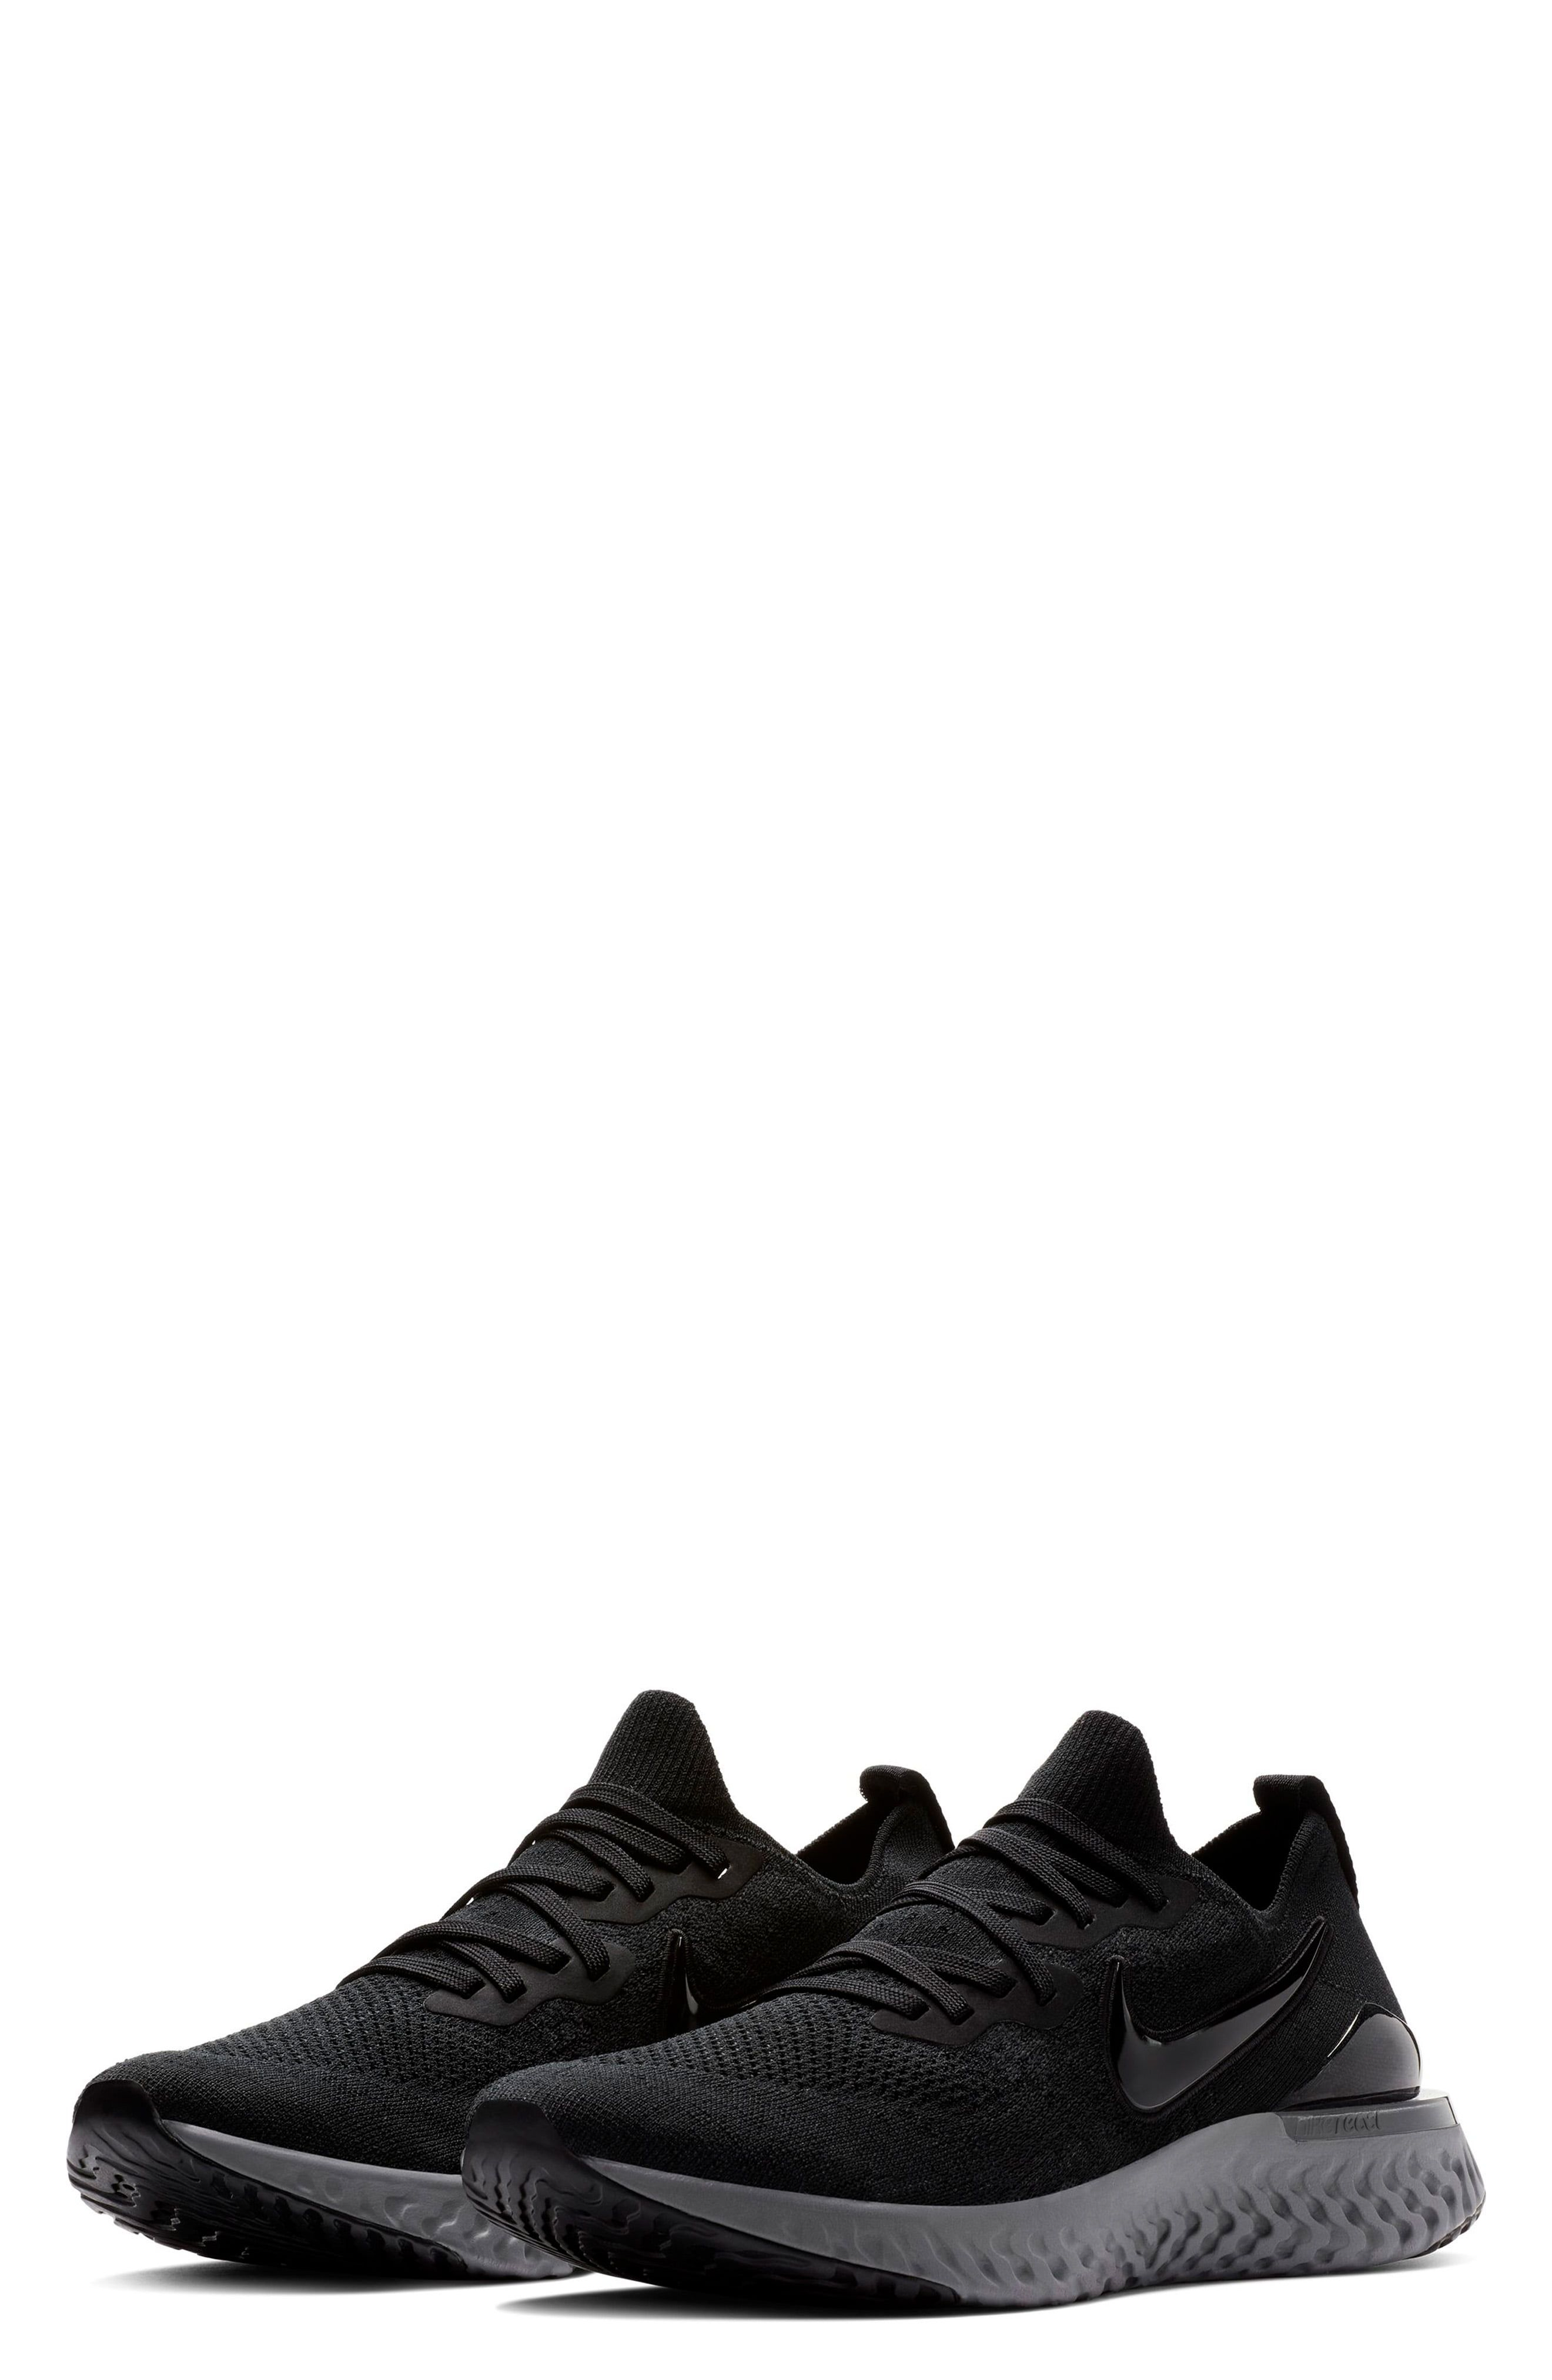 In 2019 Tiles Nike Epic React Flyknit 2 Training Schuhe